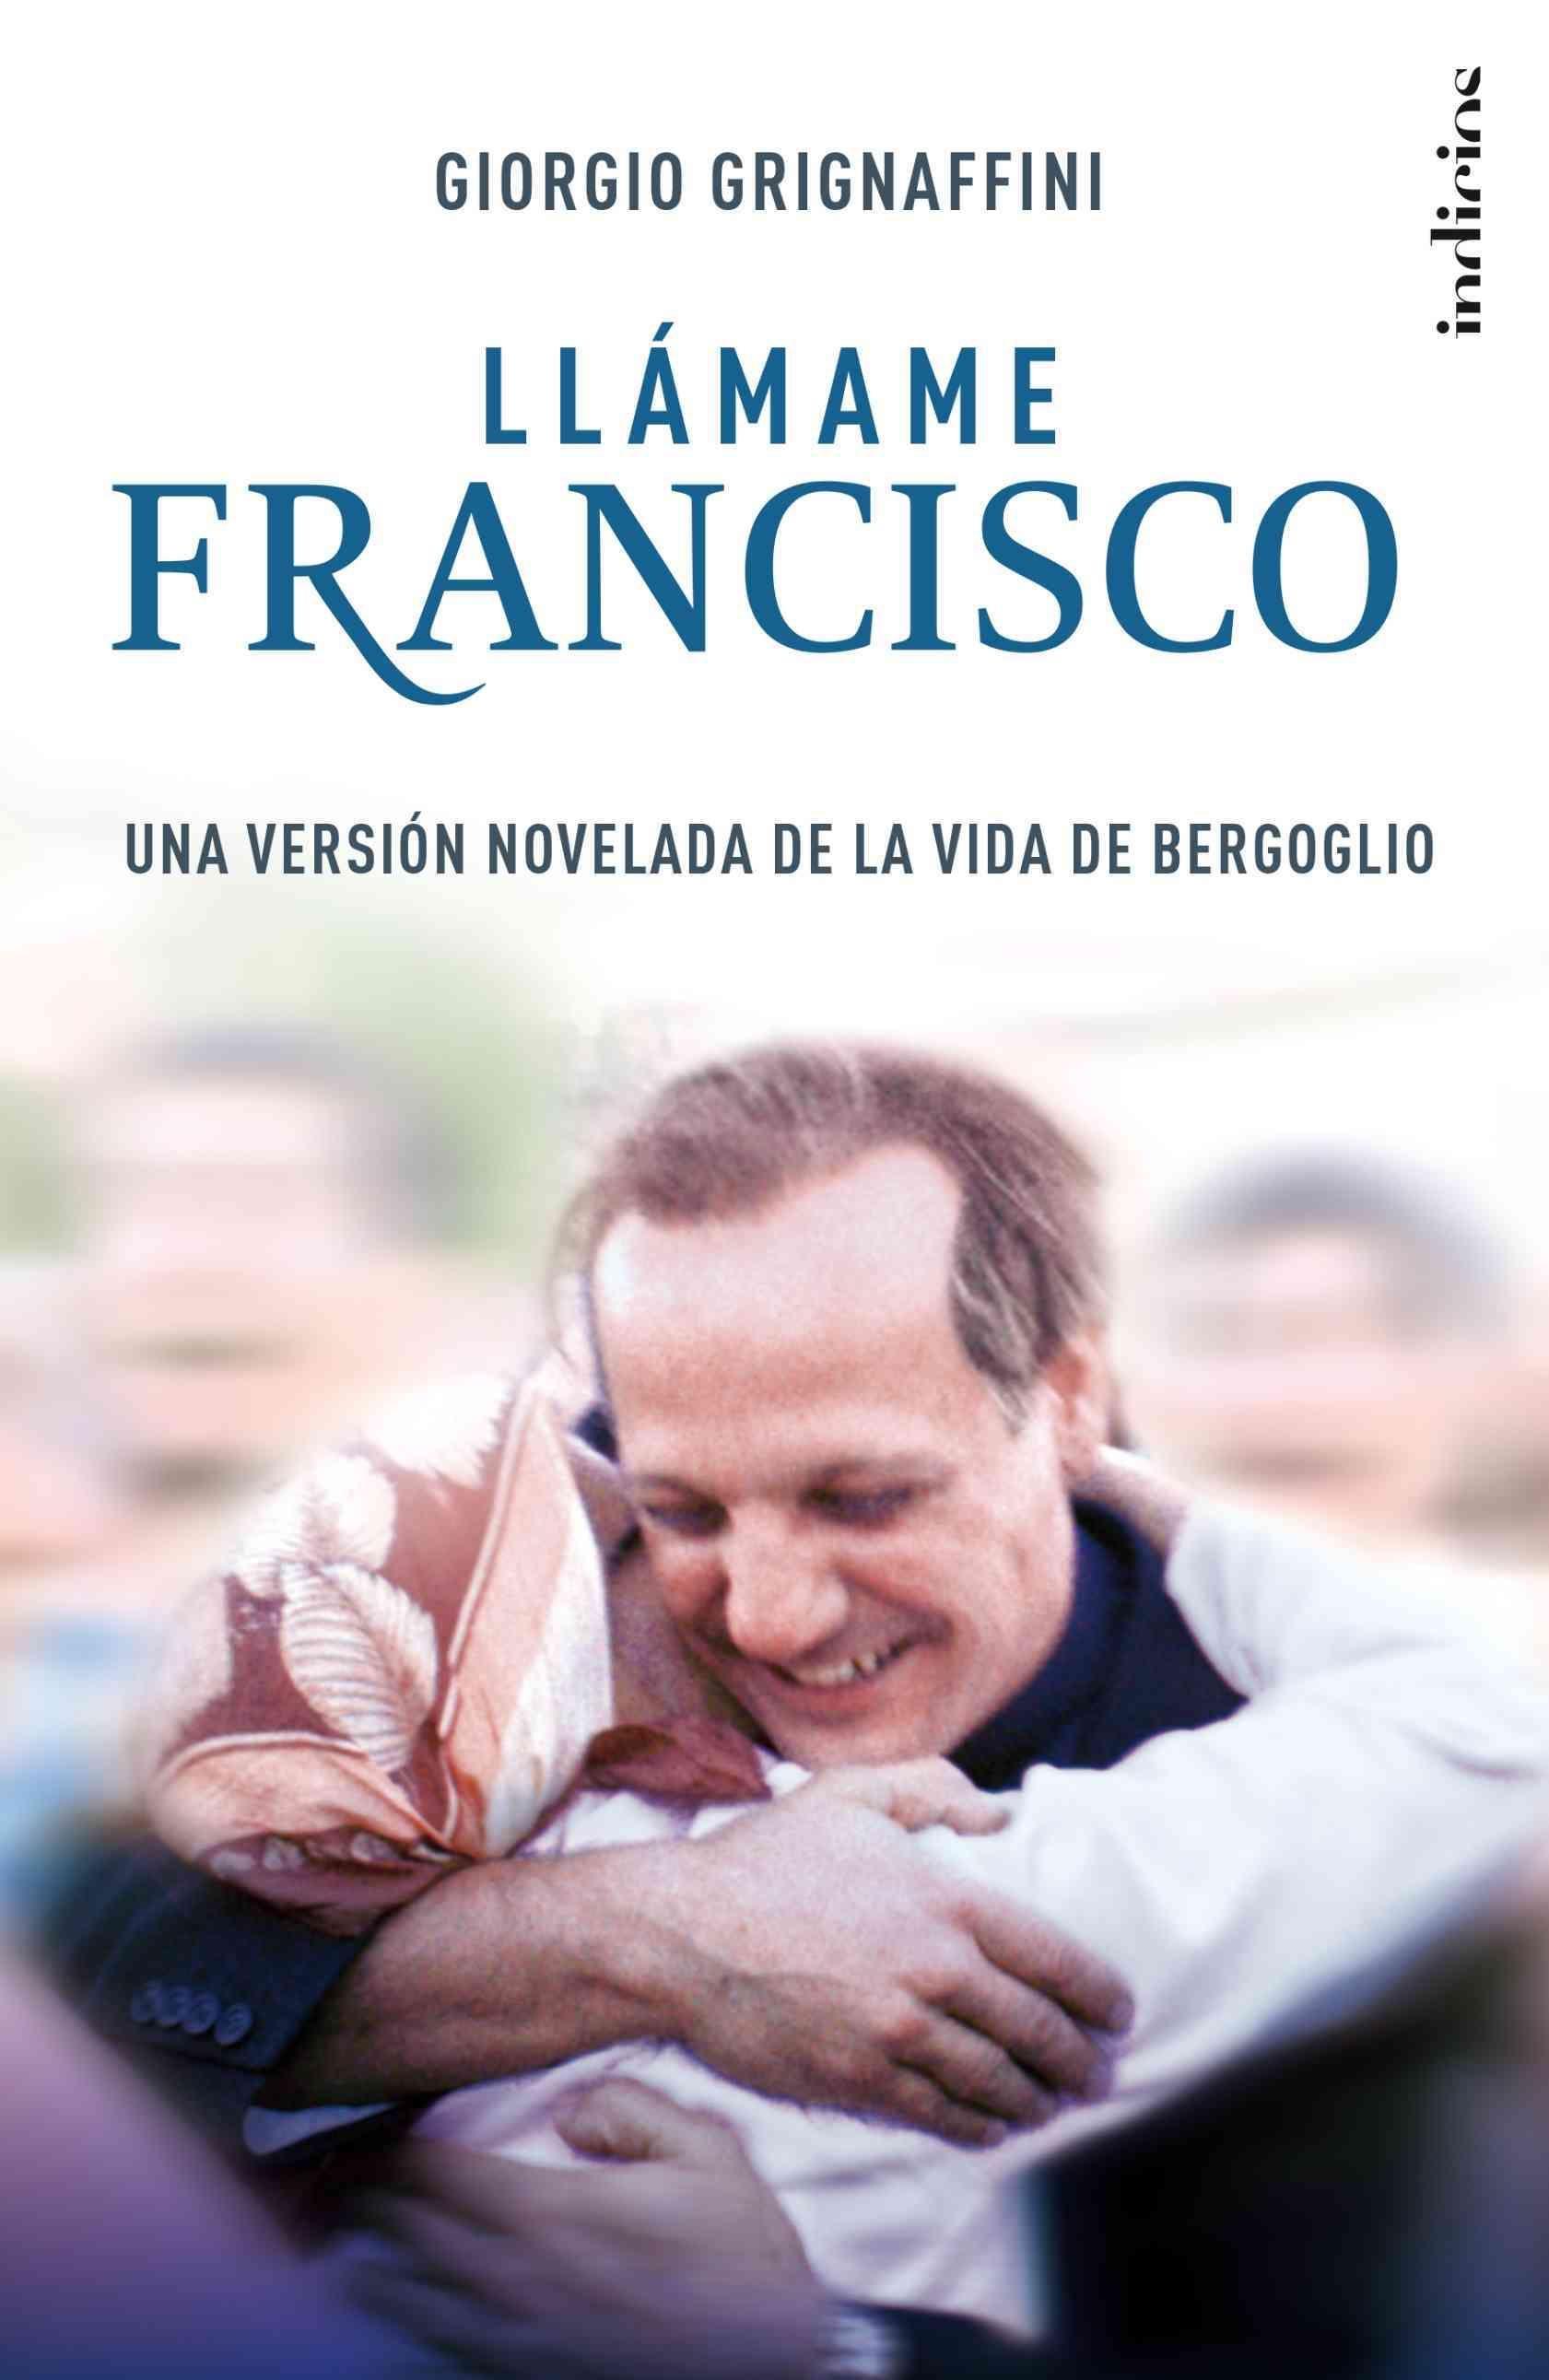 Llamame Francisco/ Call Me Francis 映画, ローマ法王, 予告編